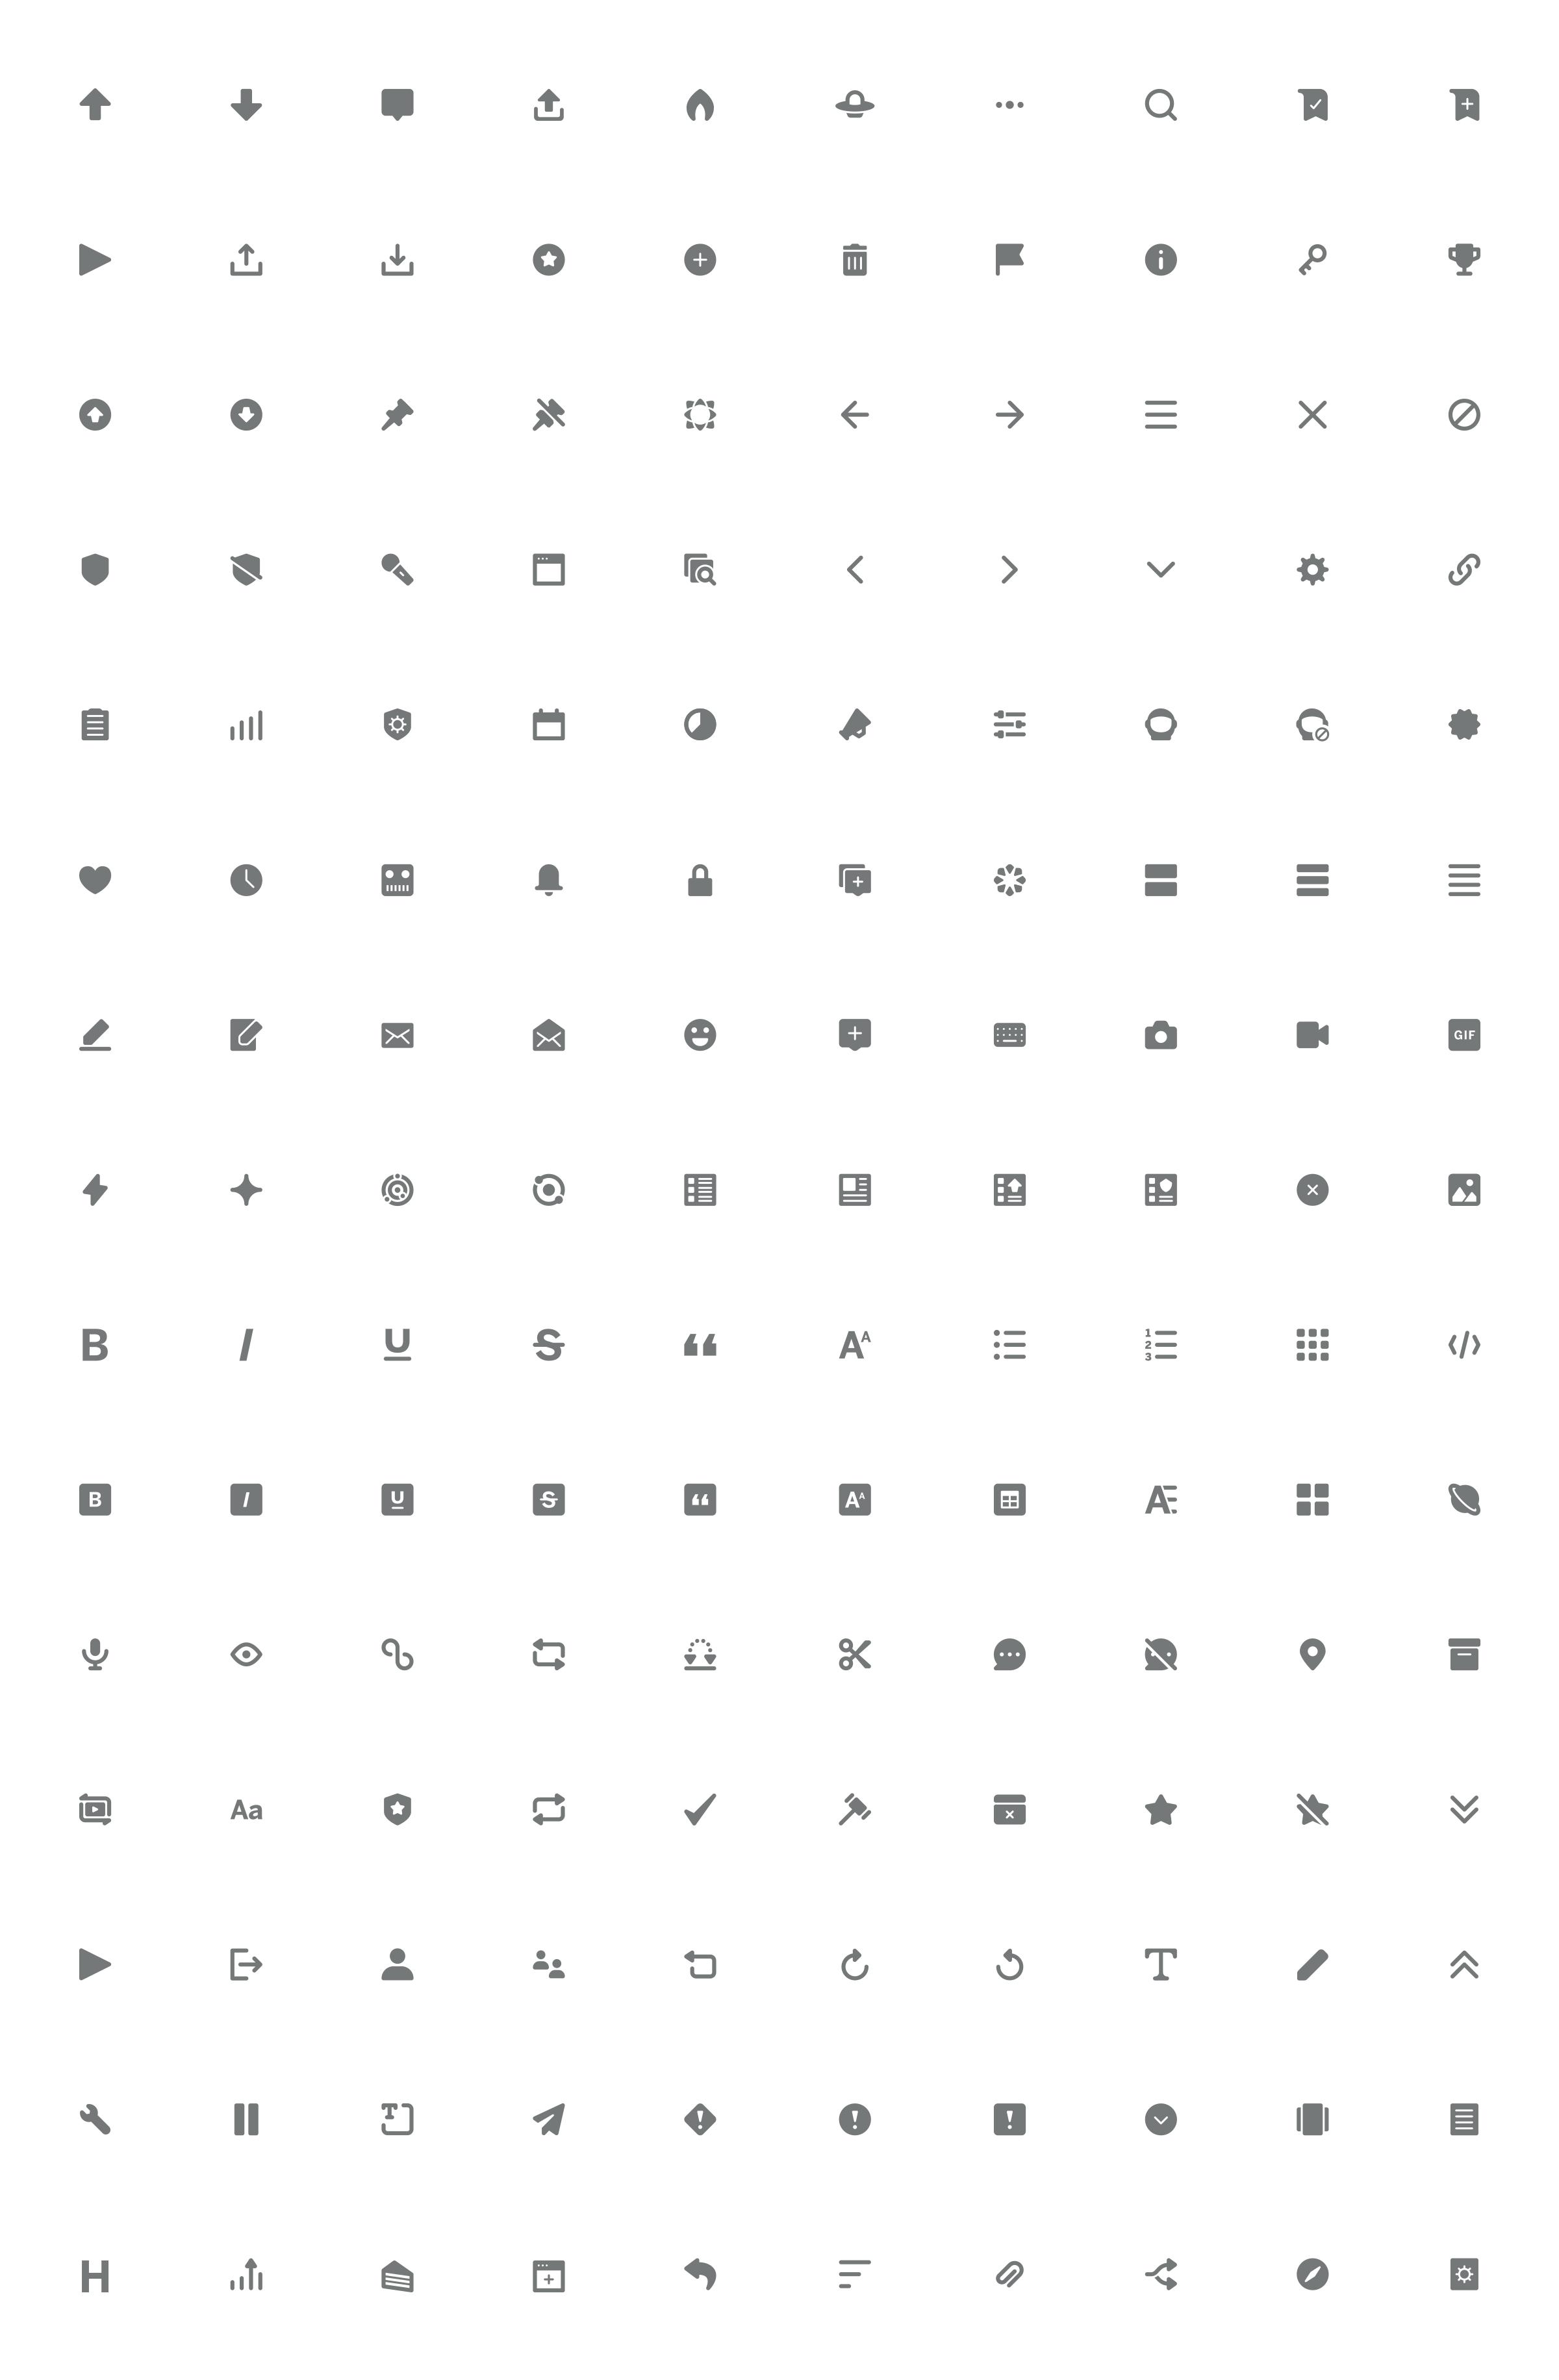 Reddit-Icons_2020